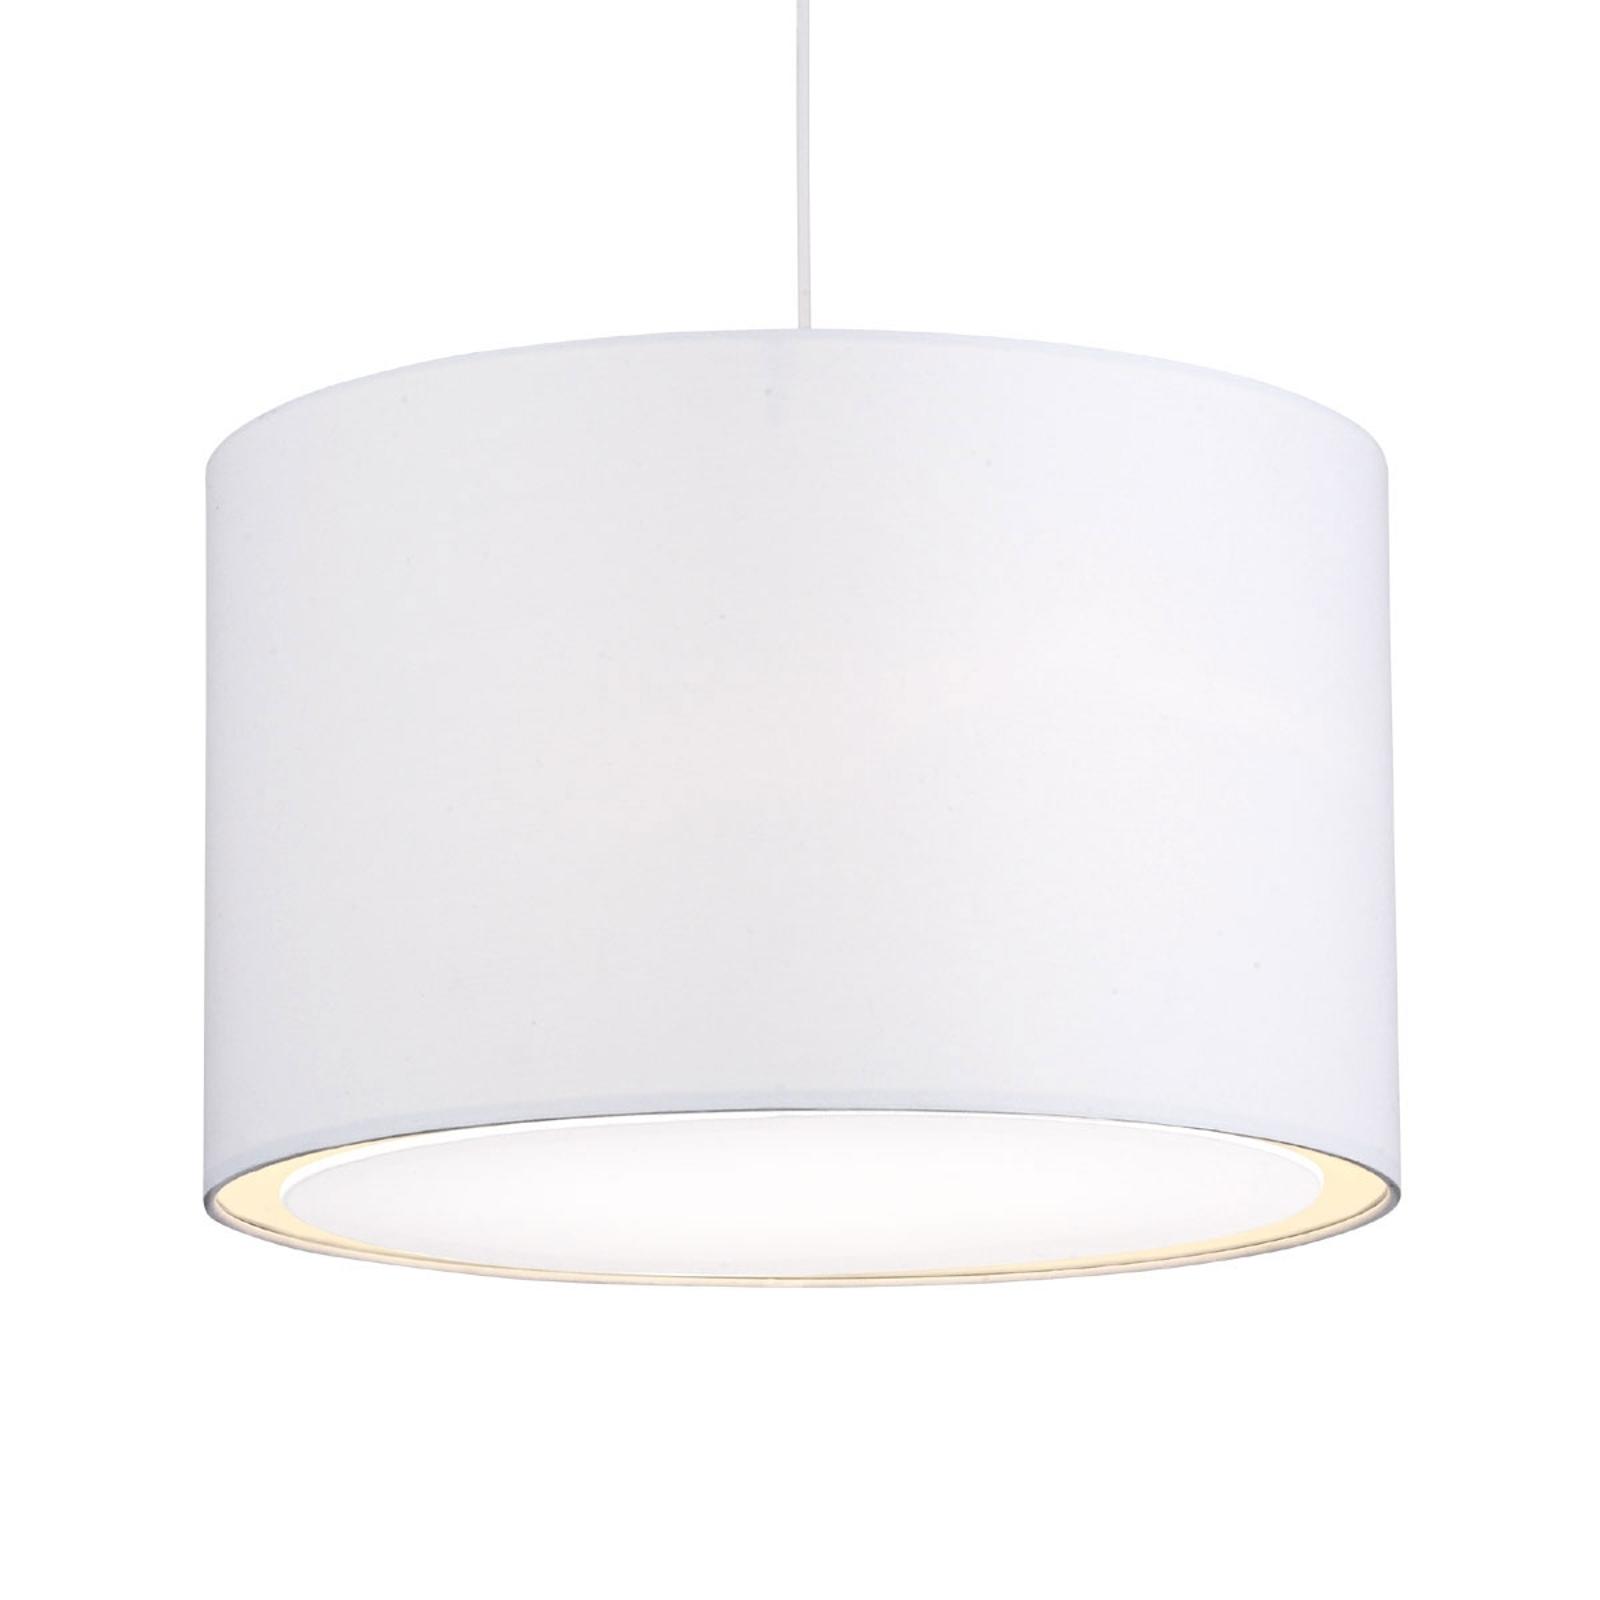 Classic-modern hanging light Clarie_1508812_1